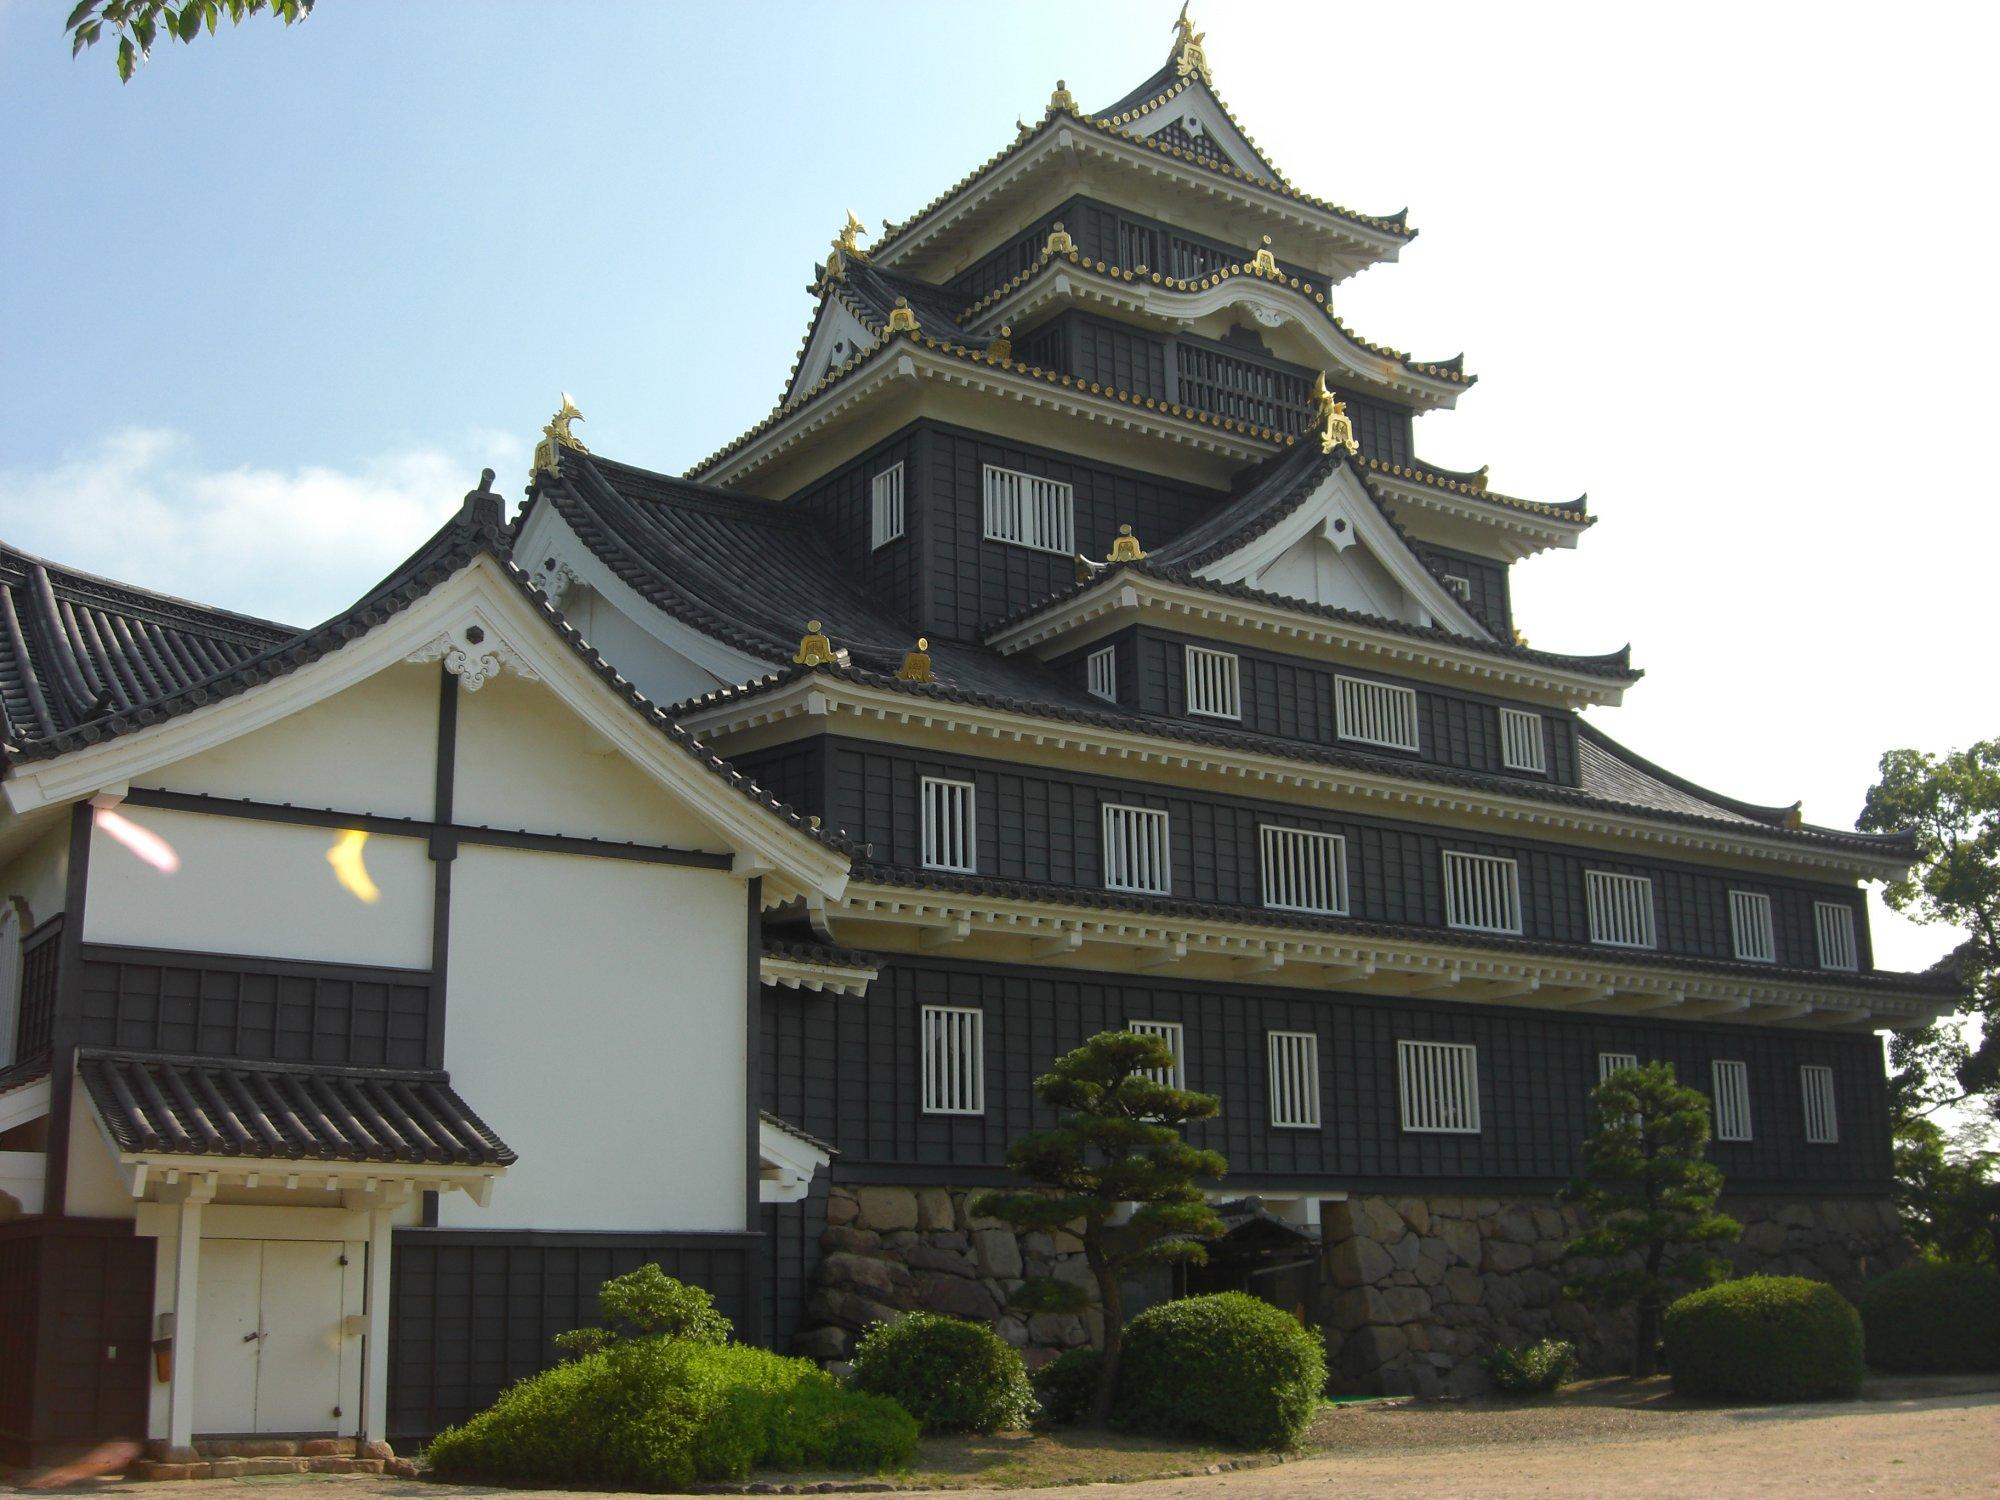 岡山城:乱世の梟雄 宇喜多直家の居城 【お城特集 日本の歴史】